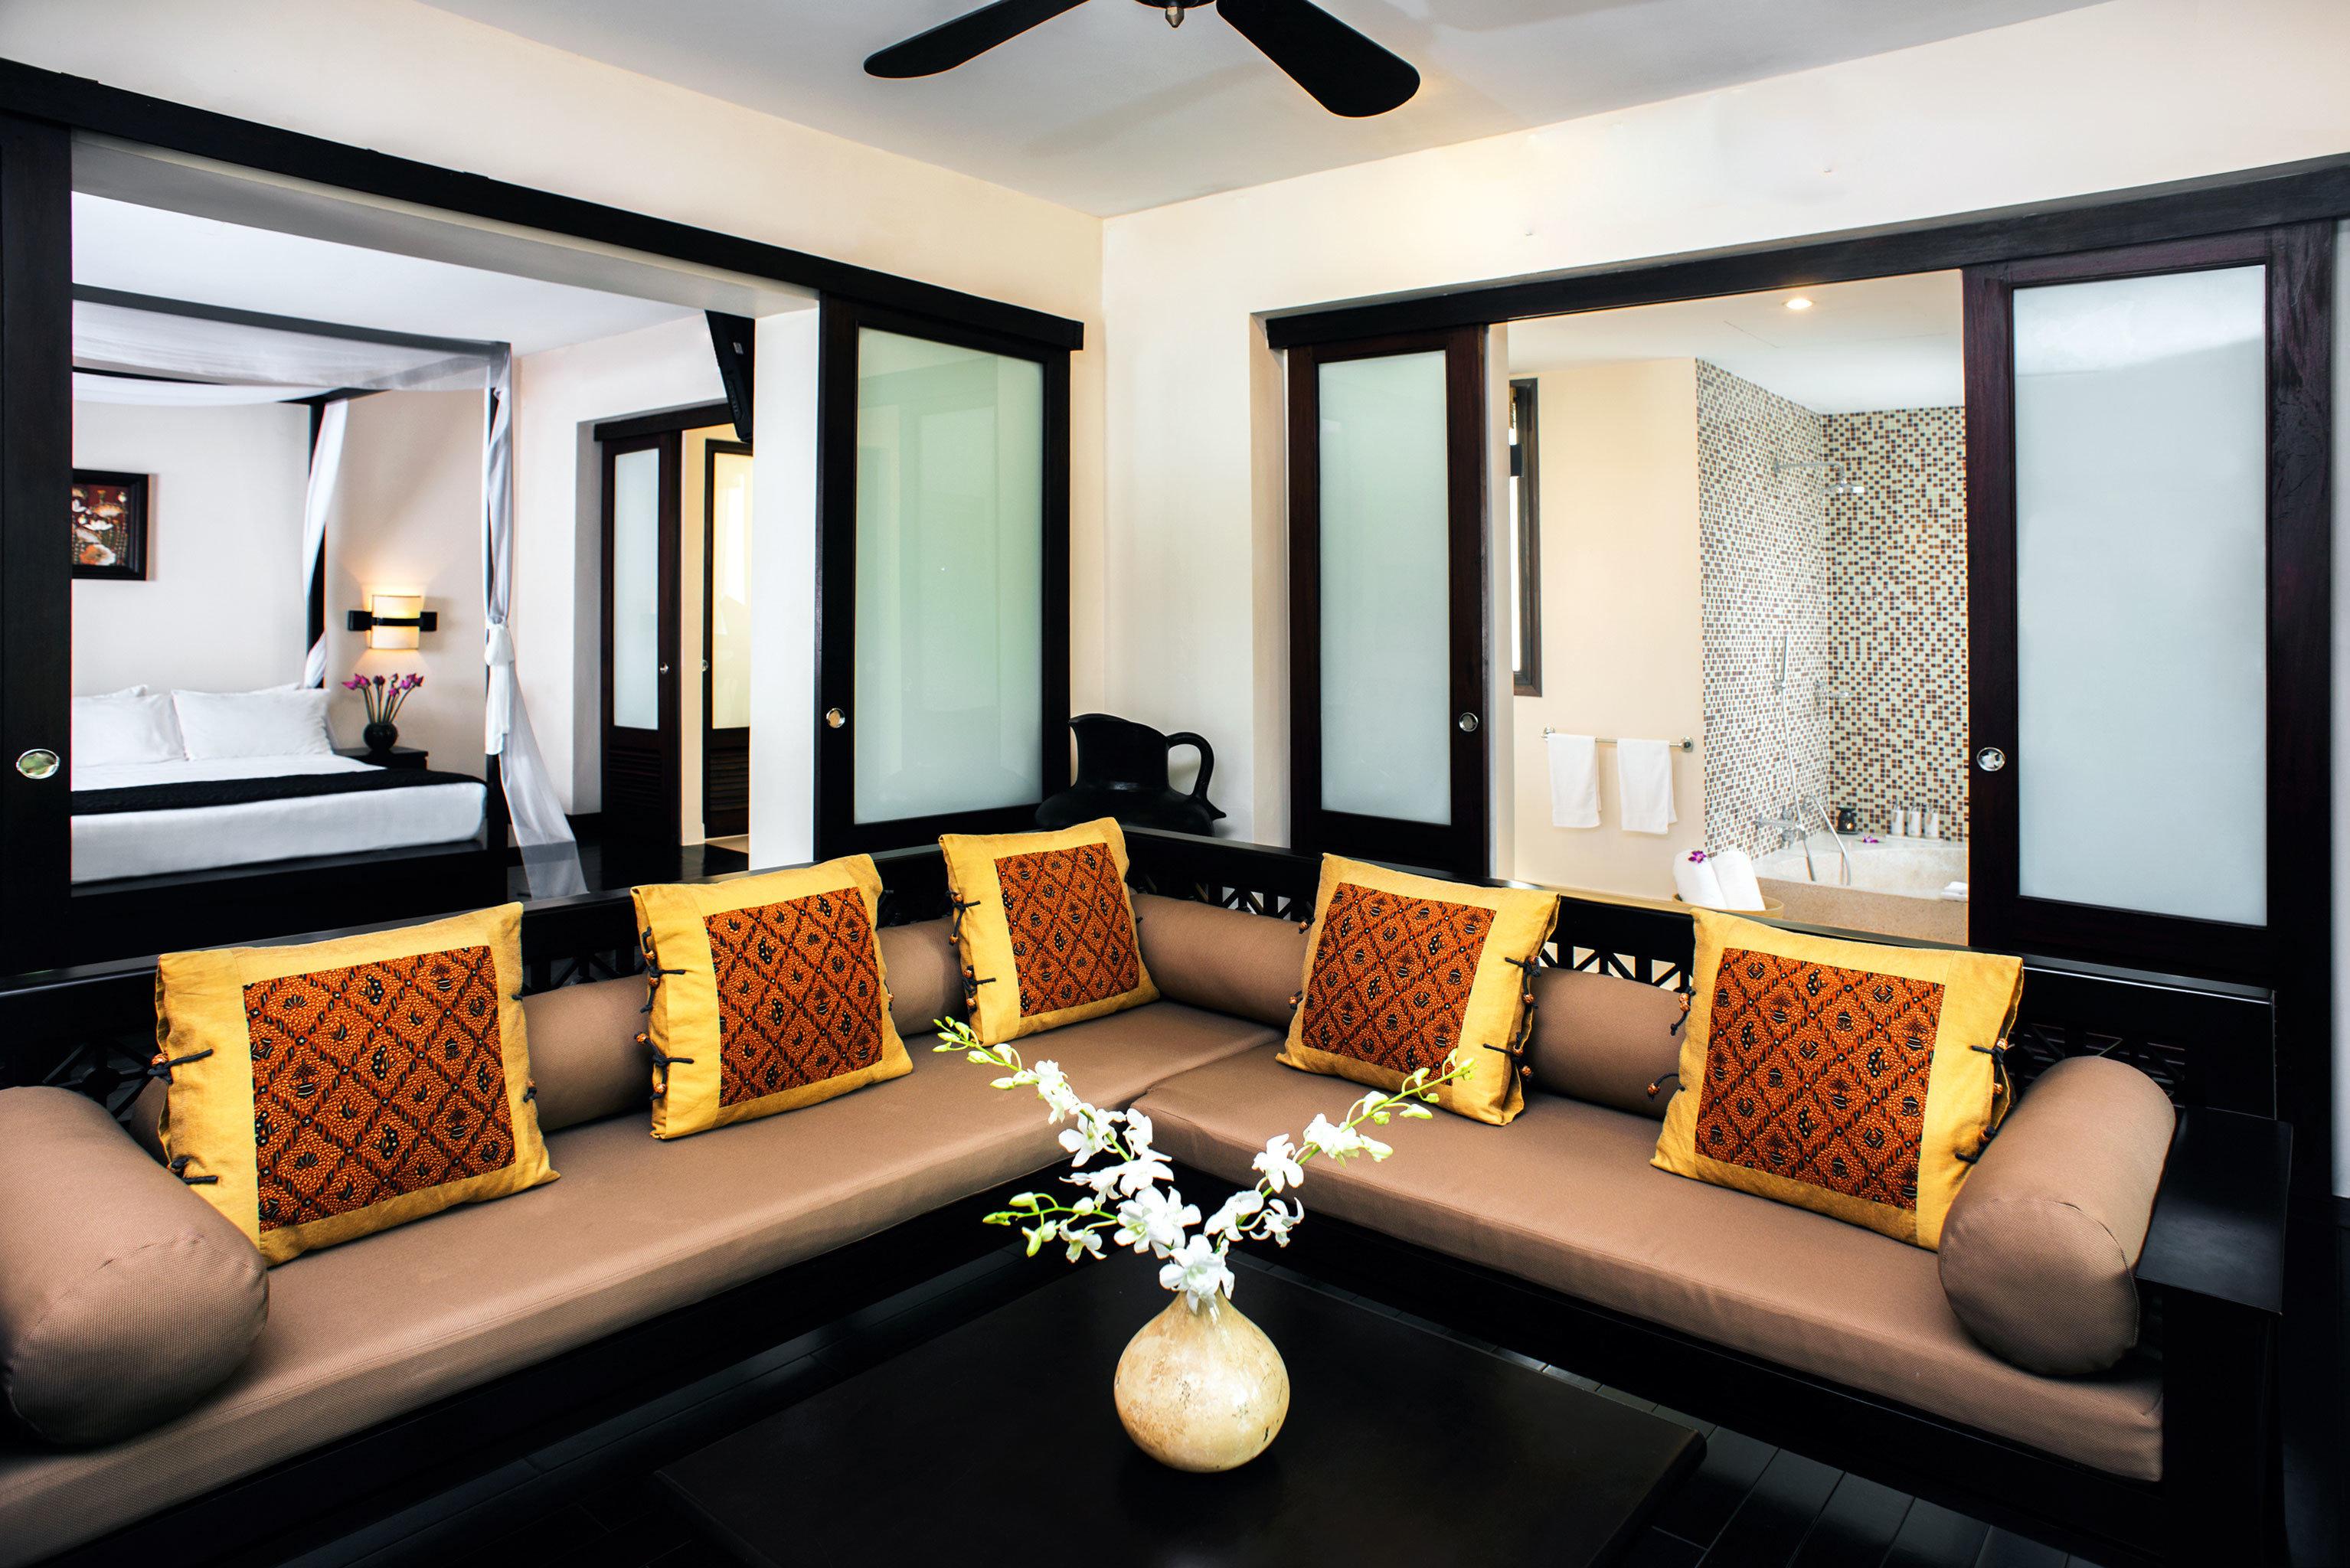 Bath Bedroom Cultural Jungle Lounge River Suite Tropical Waterfront property living room home recreation room condominium sofa